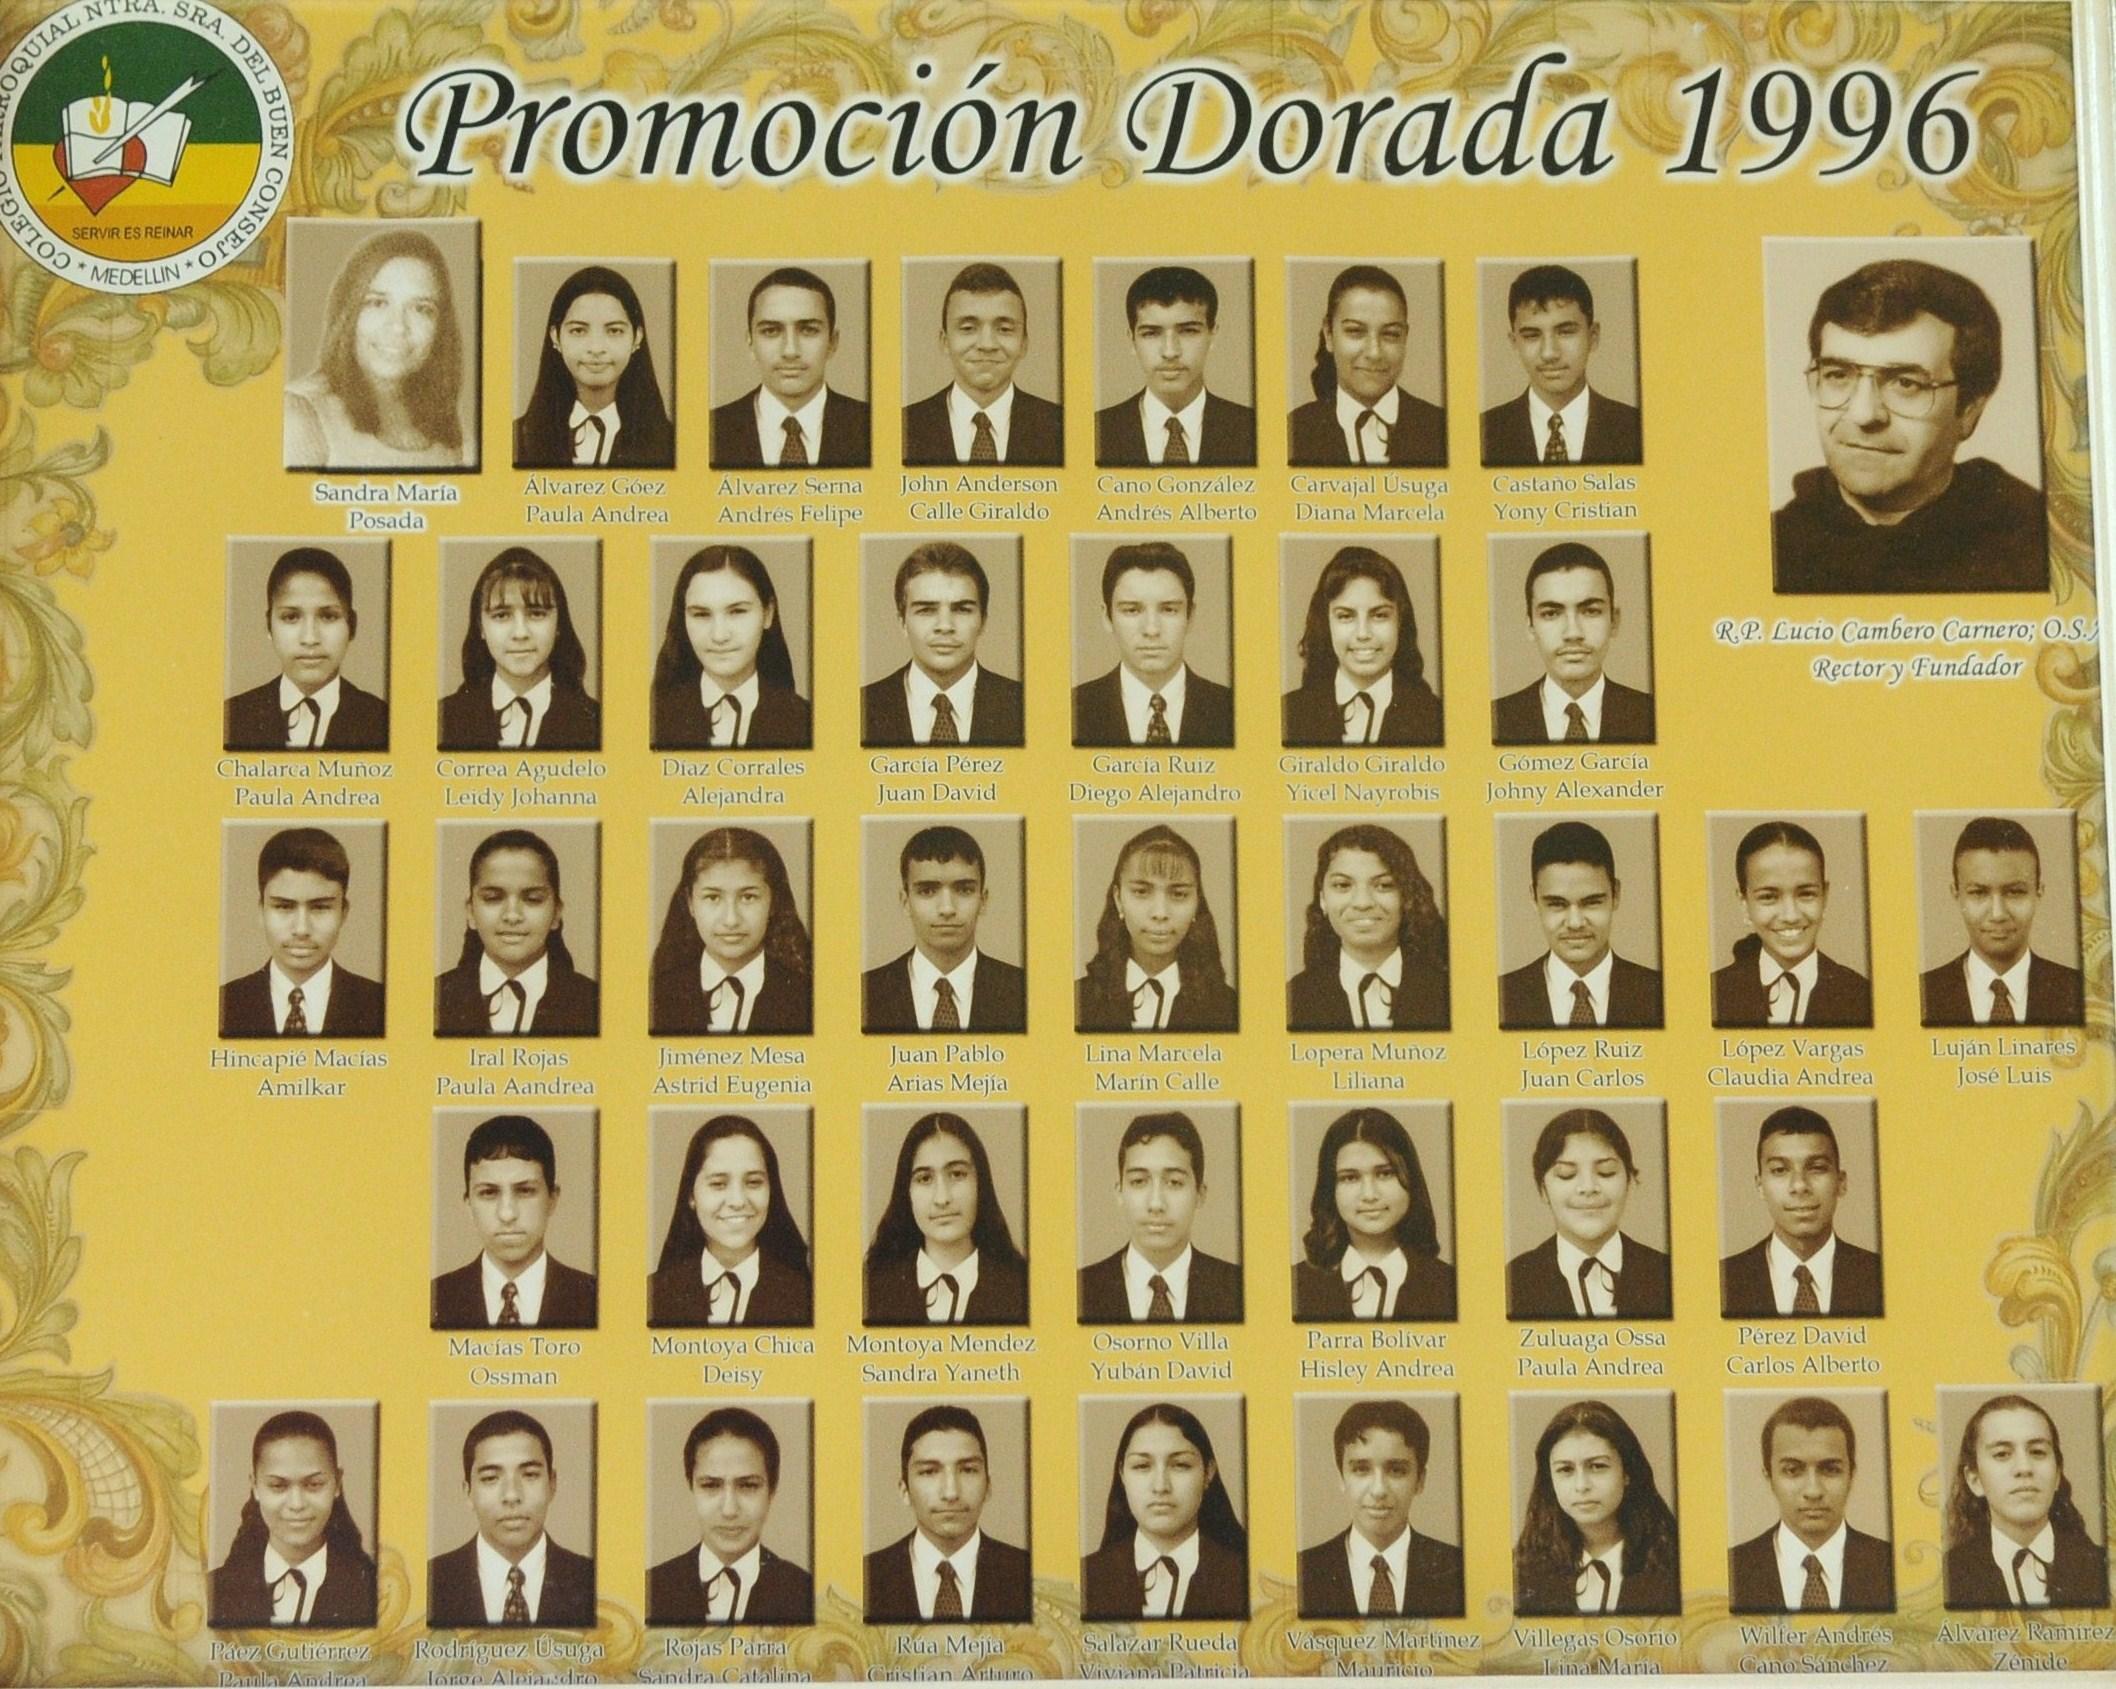 DORADA 1996